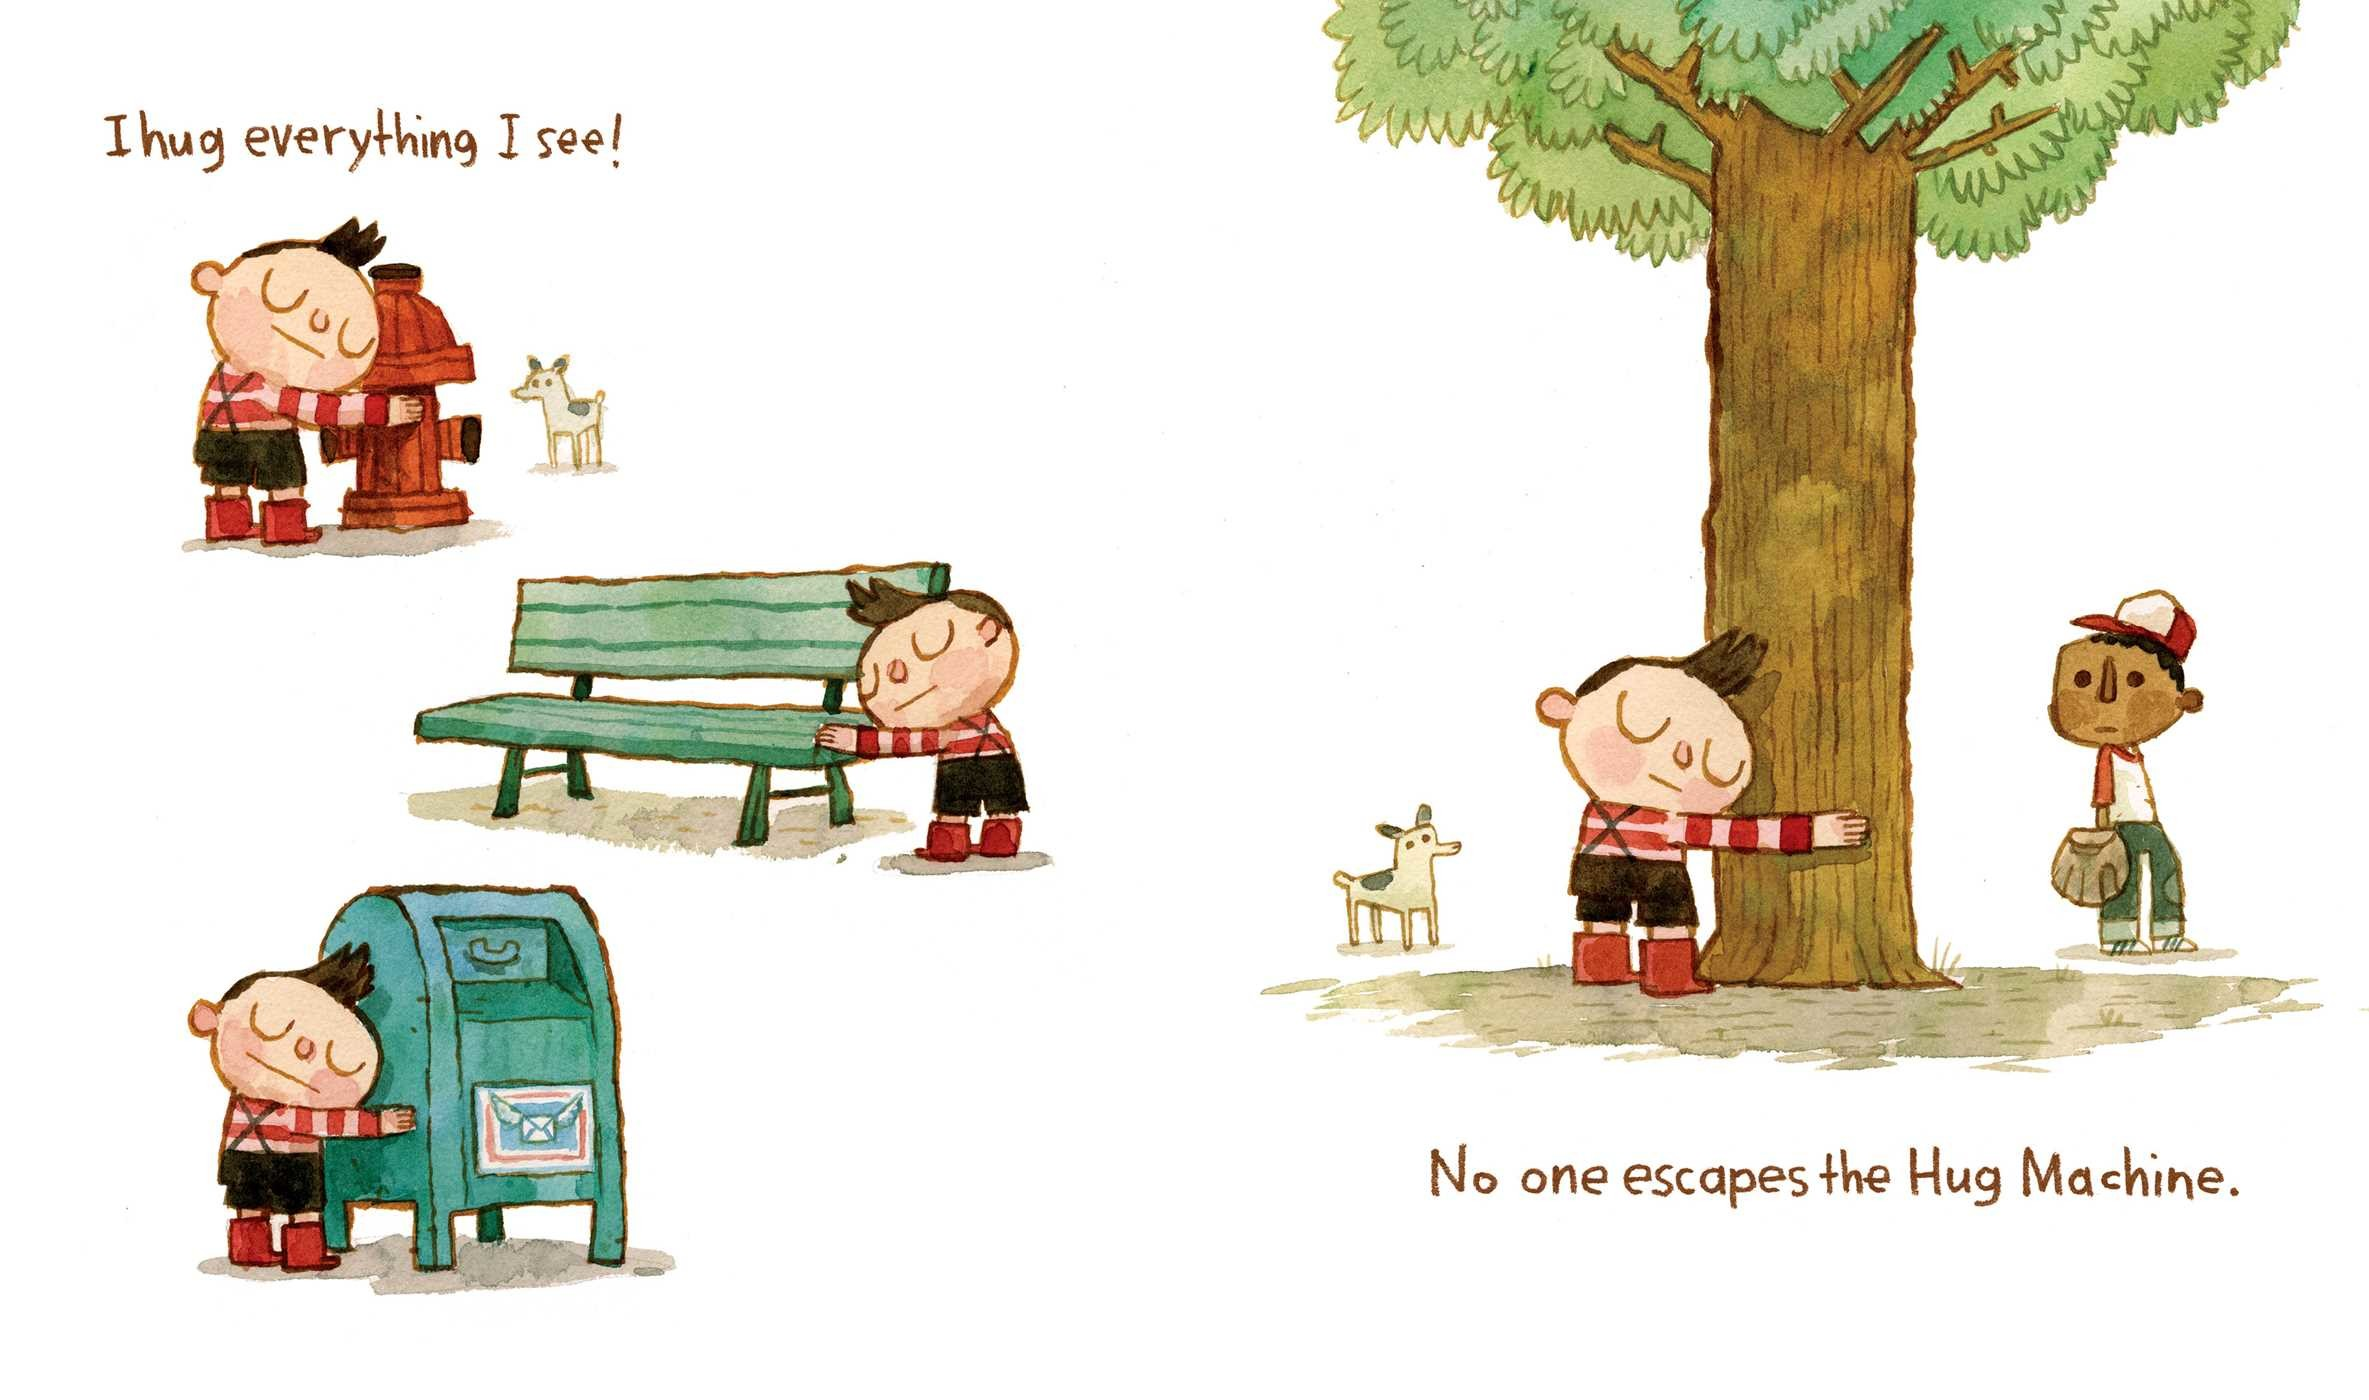 celebrate-picture-books-picture-book-review-hug-machine-fire-hydrants